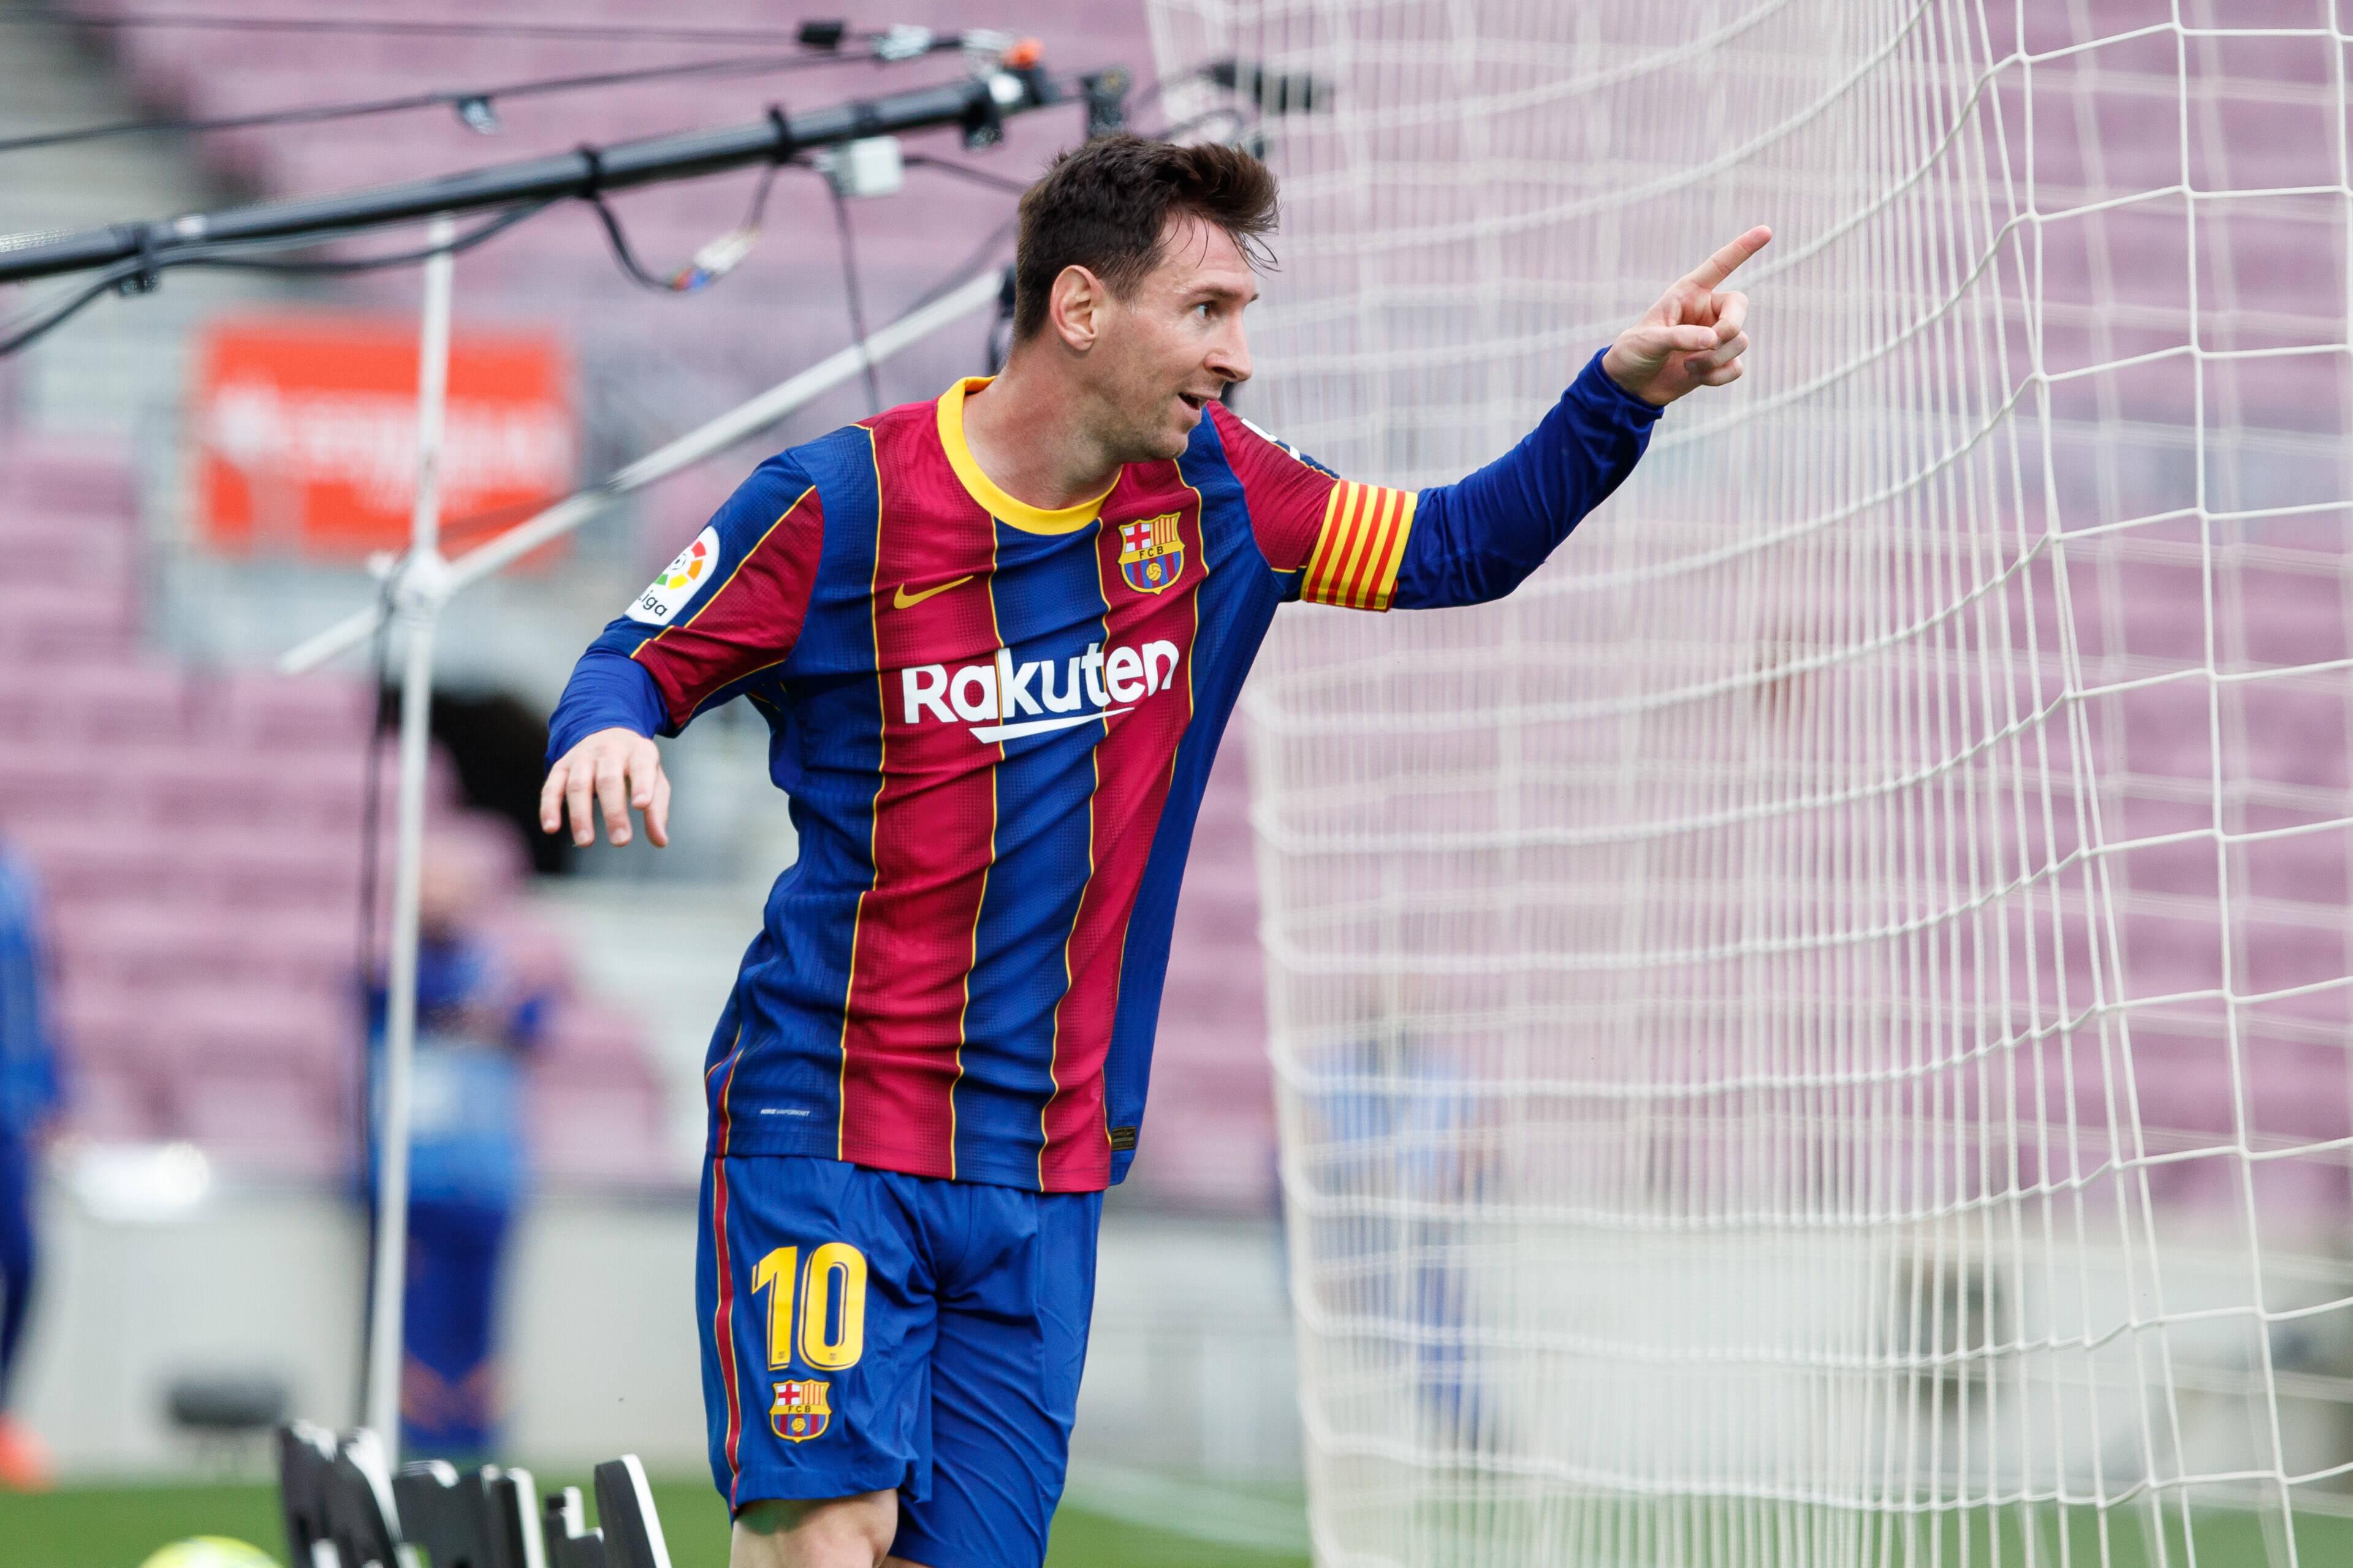 Ronald Koeman hints at Lionel Messi exit as Barcelona's season implodes -  Football Espana